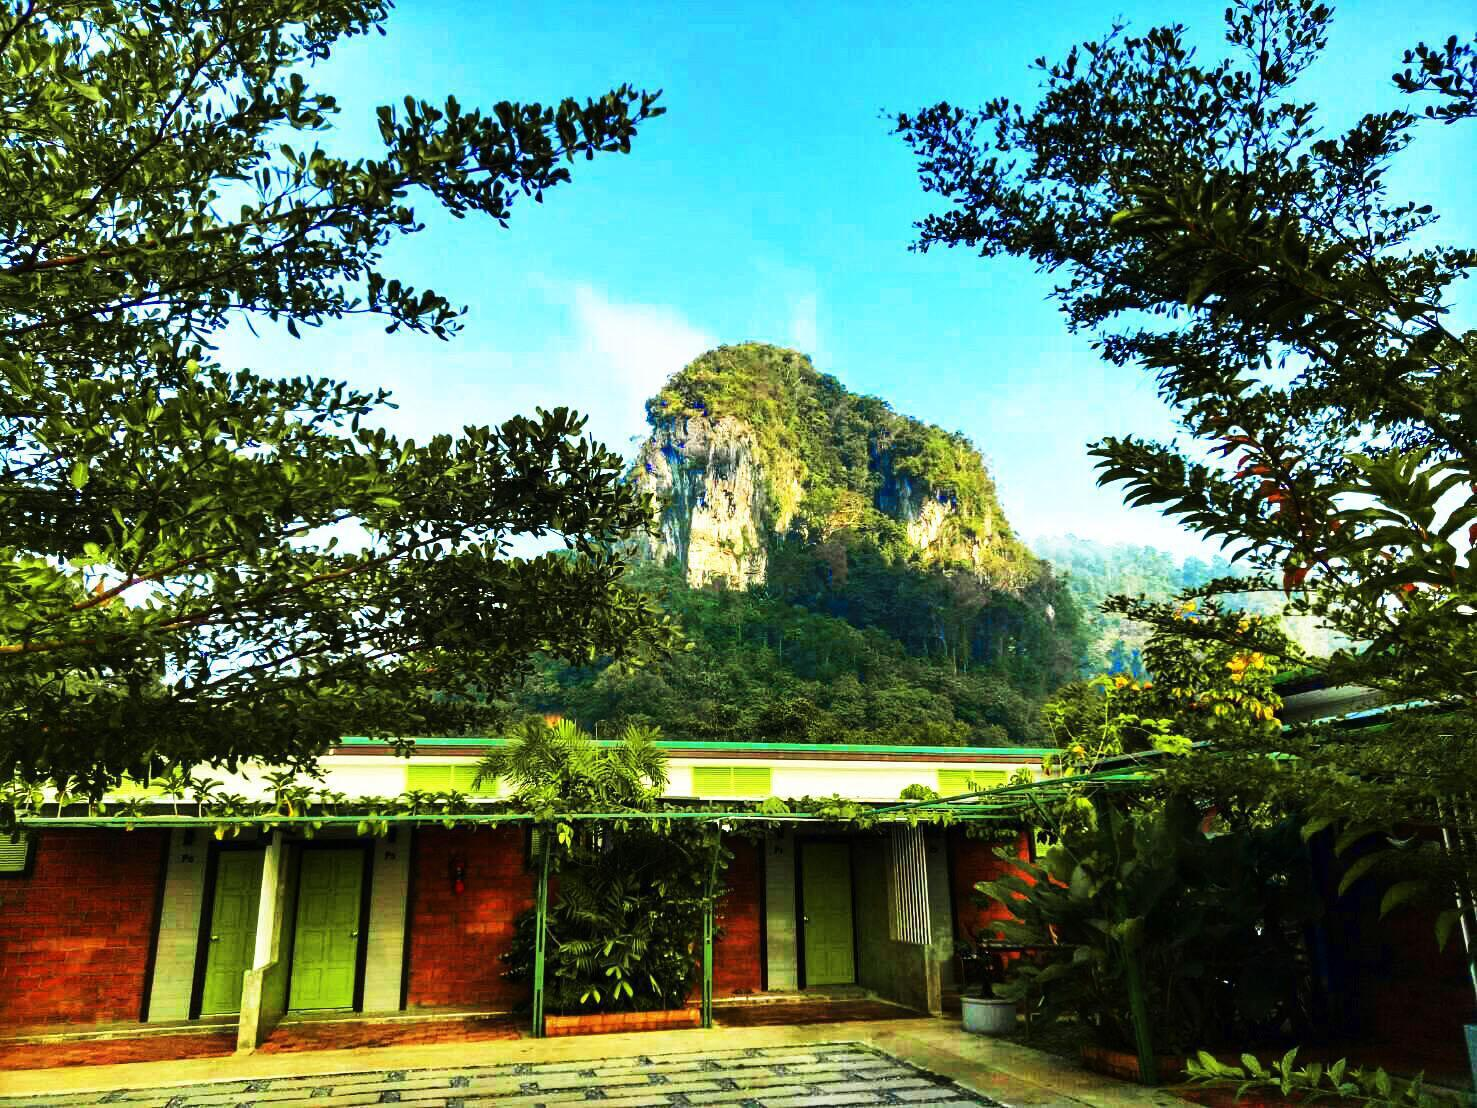 Phupat Resort สตูดิโอ บังกะโล 1 ห้องน้ำส่วนตัว ขนาด 20 ตร.ม. – กระบี่ น้อย